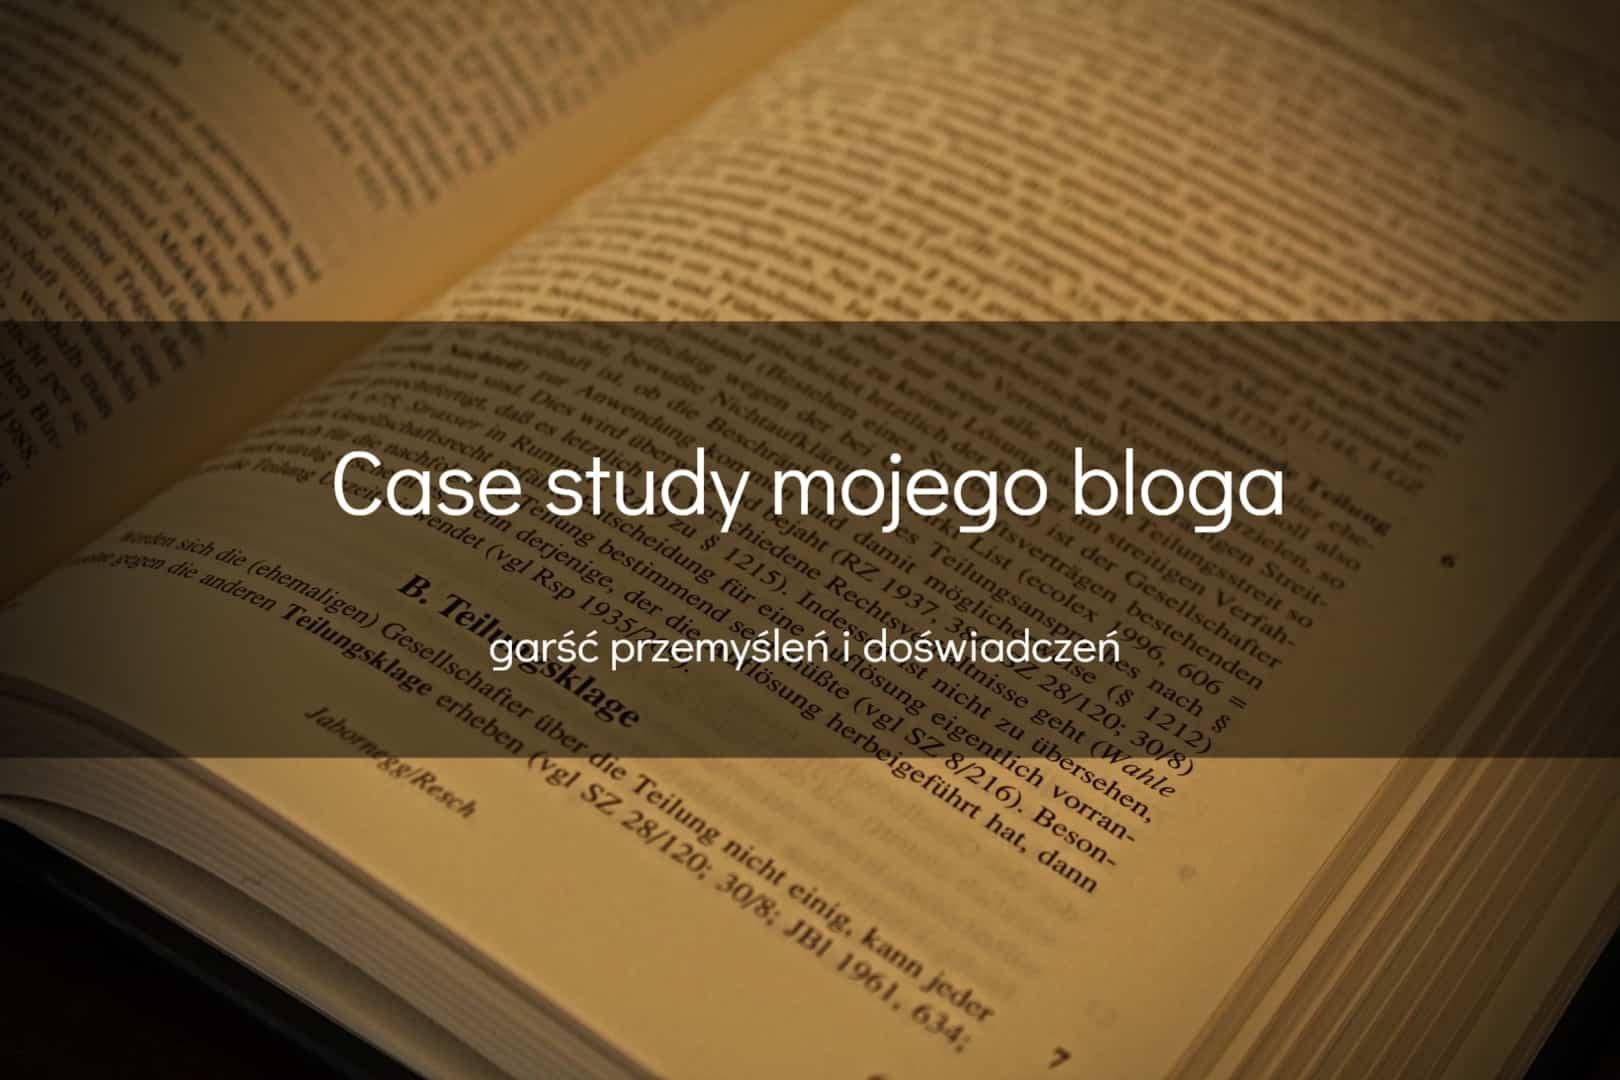 Case study mojego bloga - okładka